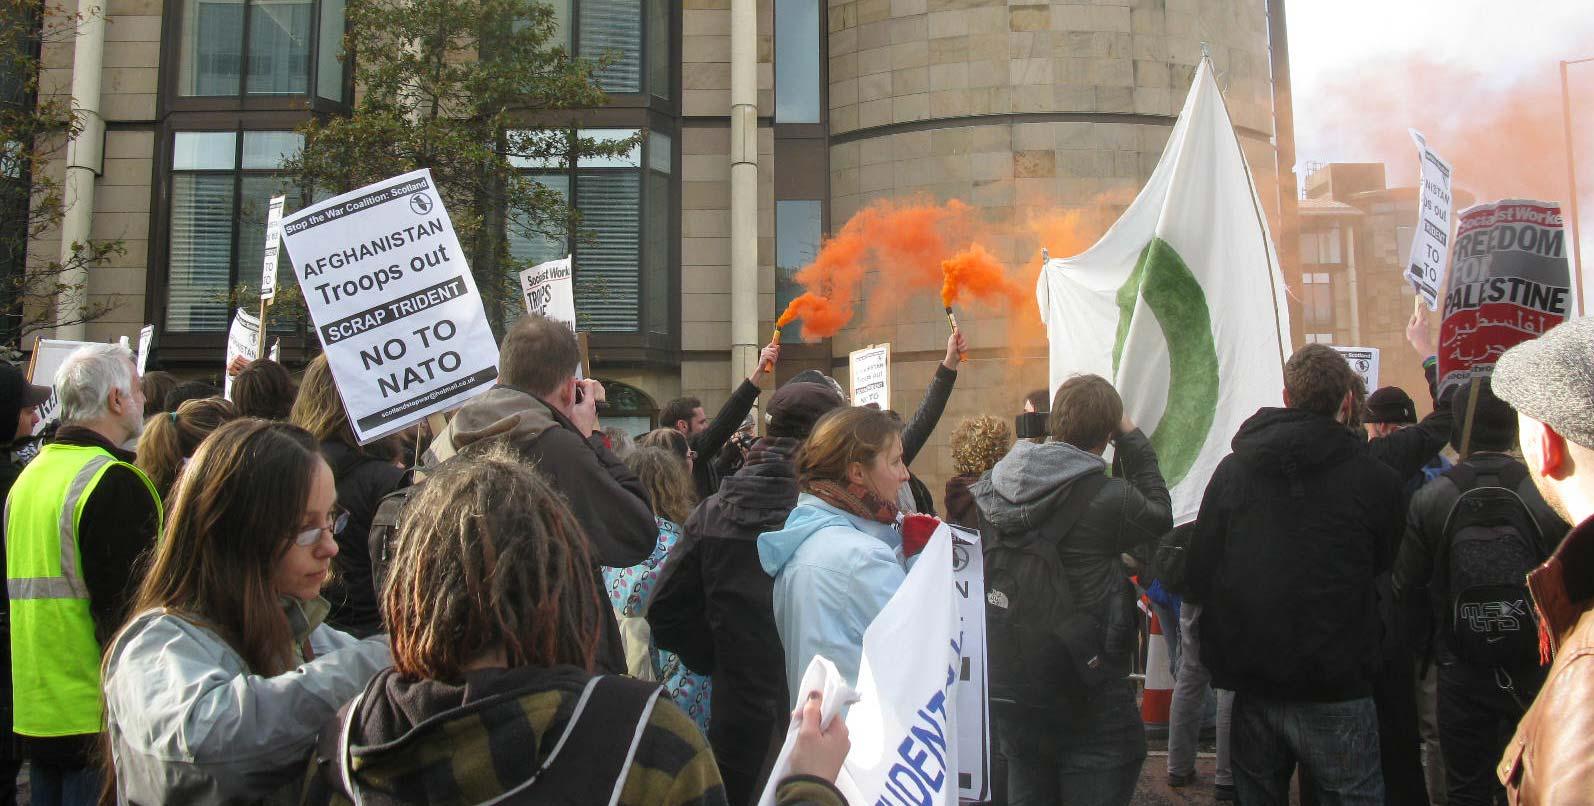 No to NATO, EICC, 2009